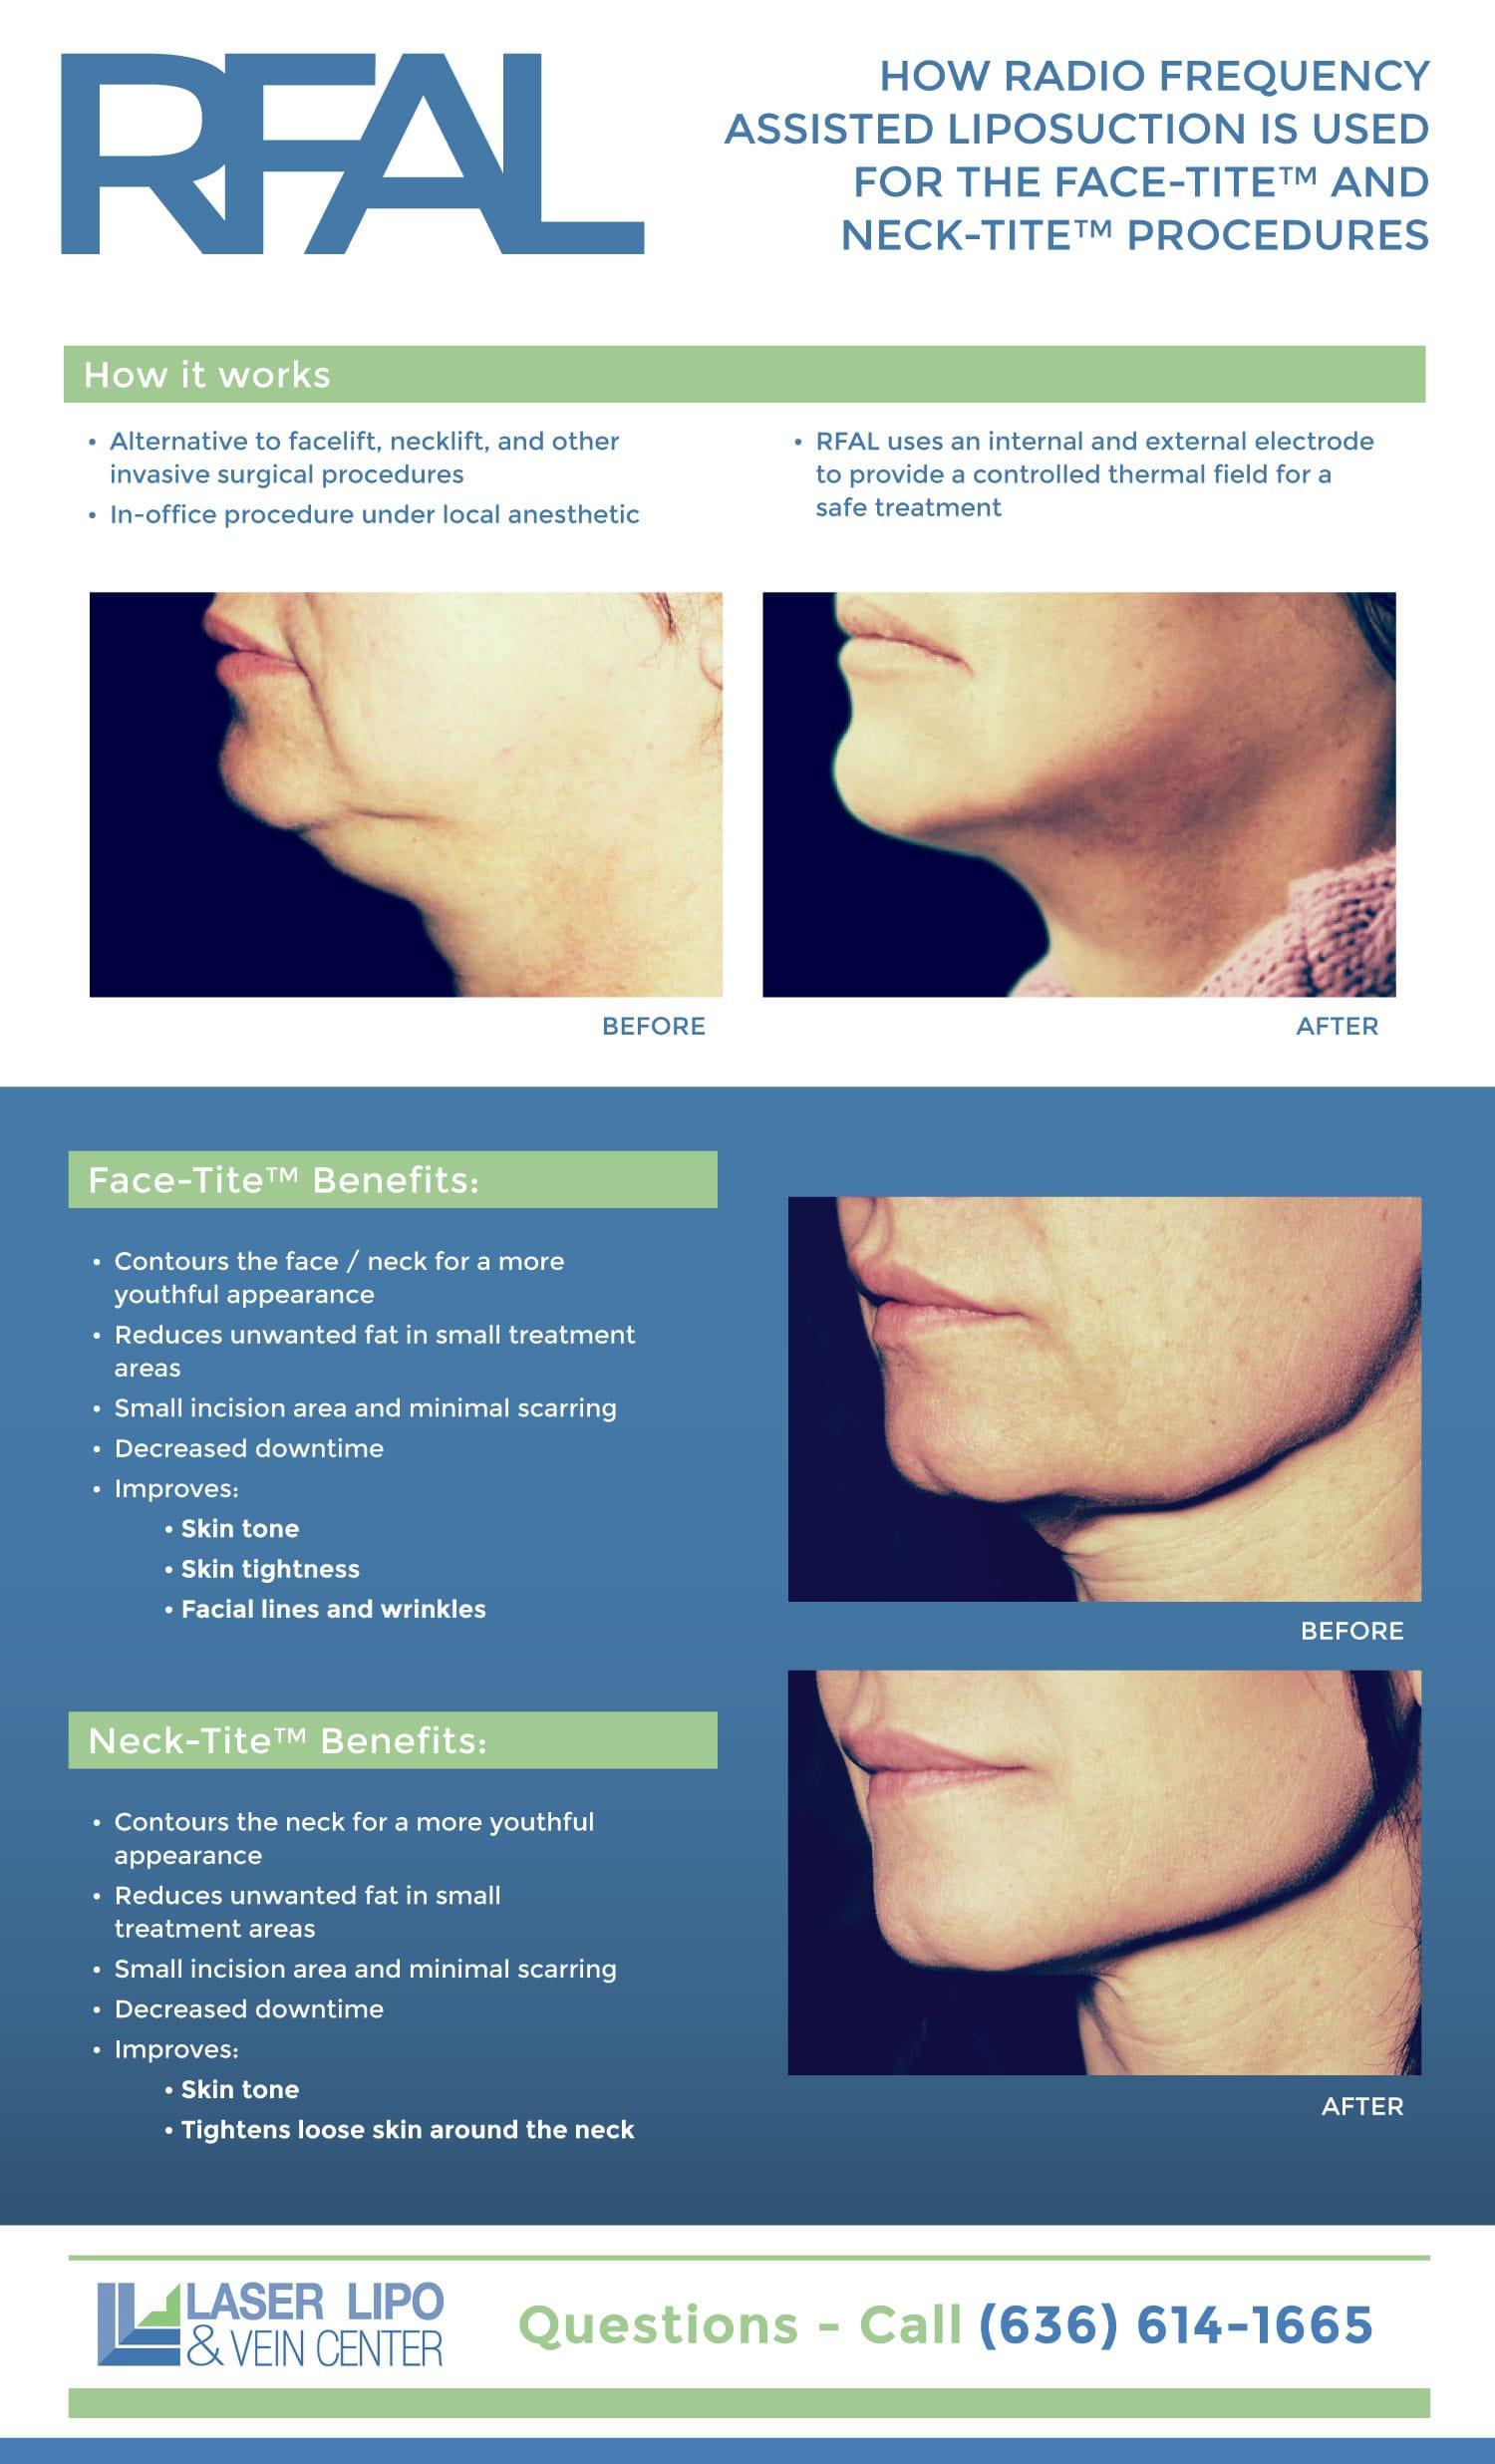 FaceTite Facelift Procedure Using RFAL